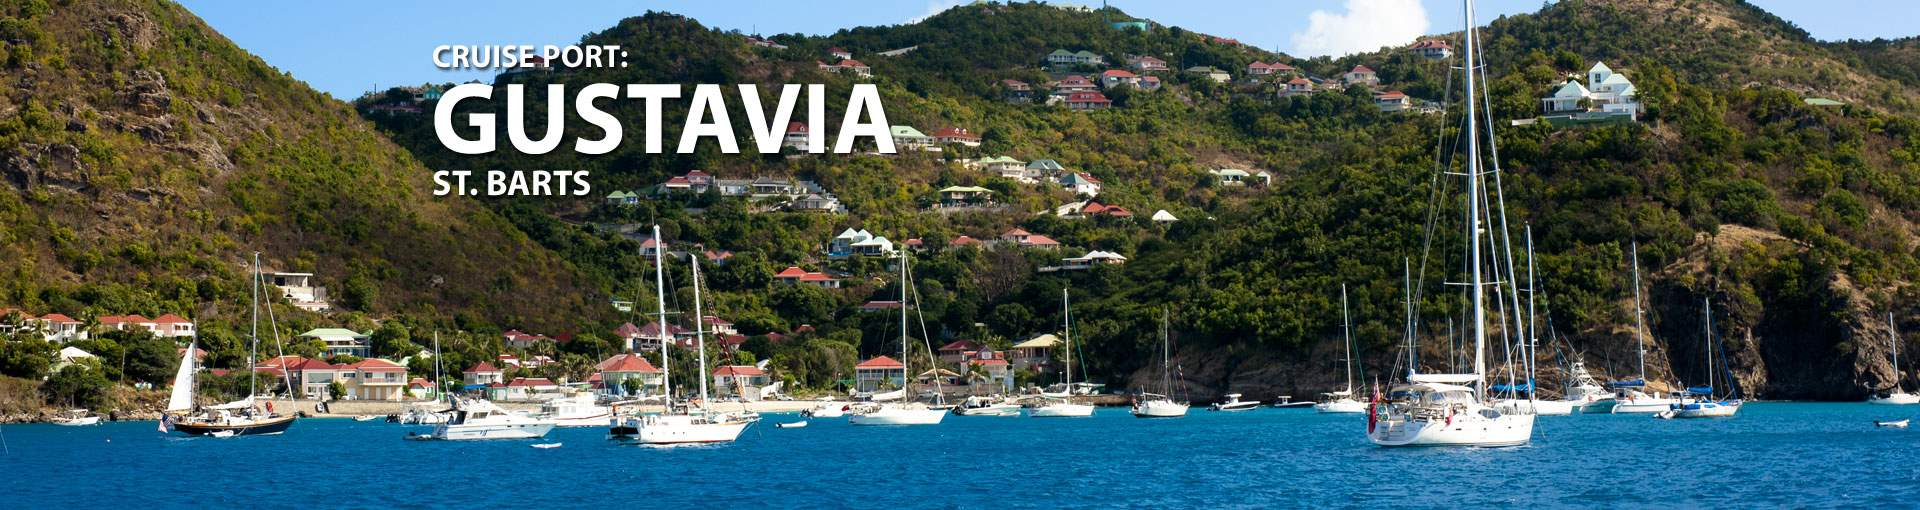 Cruises to Gustavia, St. Barts